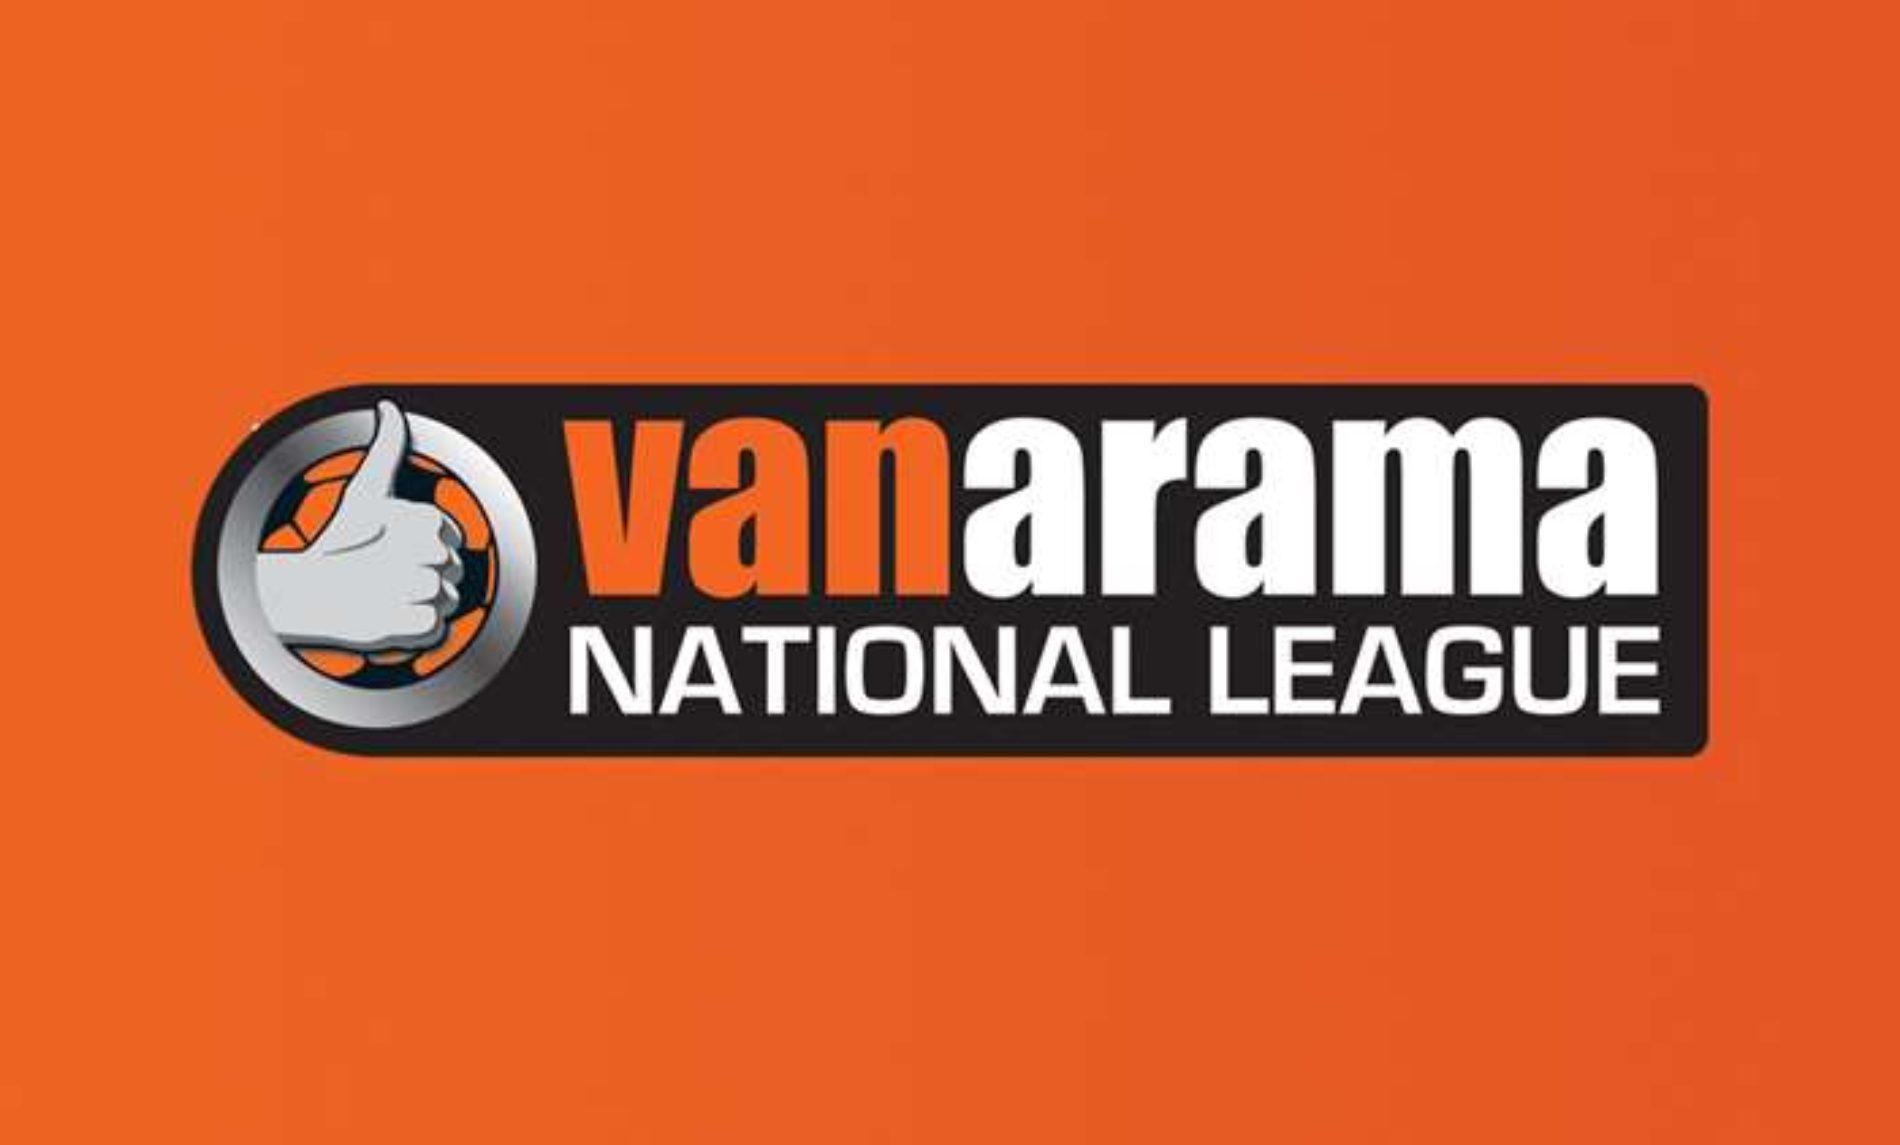 Vanarama Renews Its Title Sponsorship Of The National League